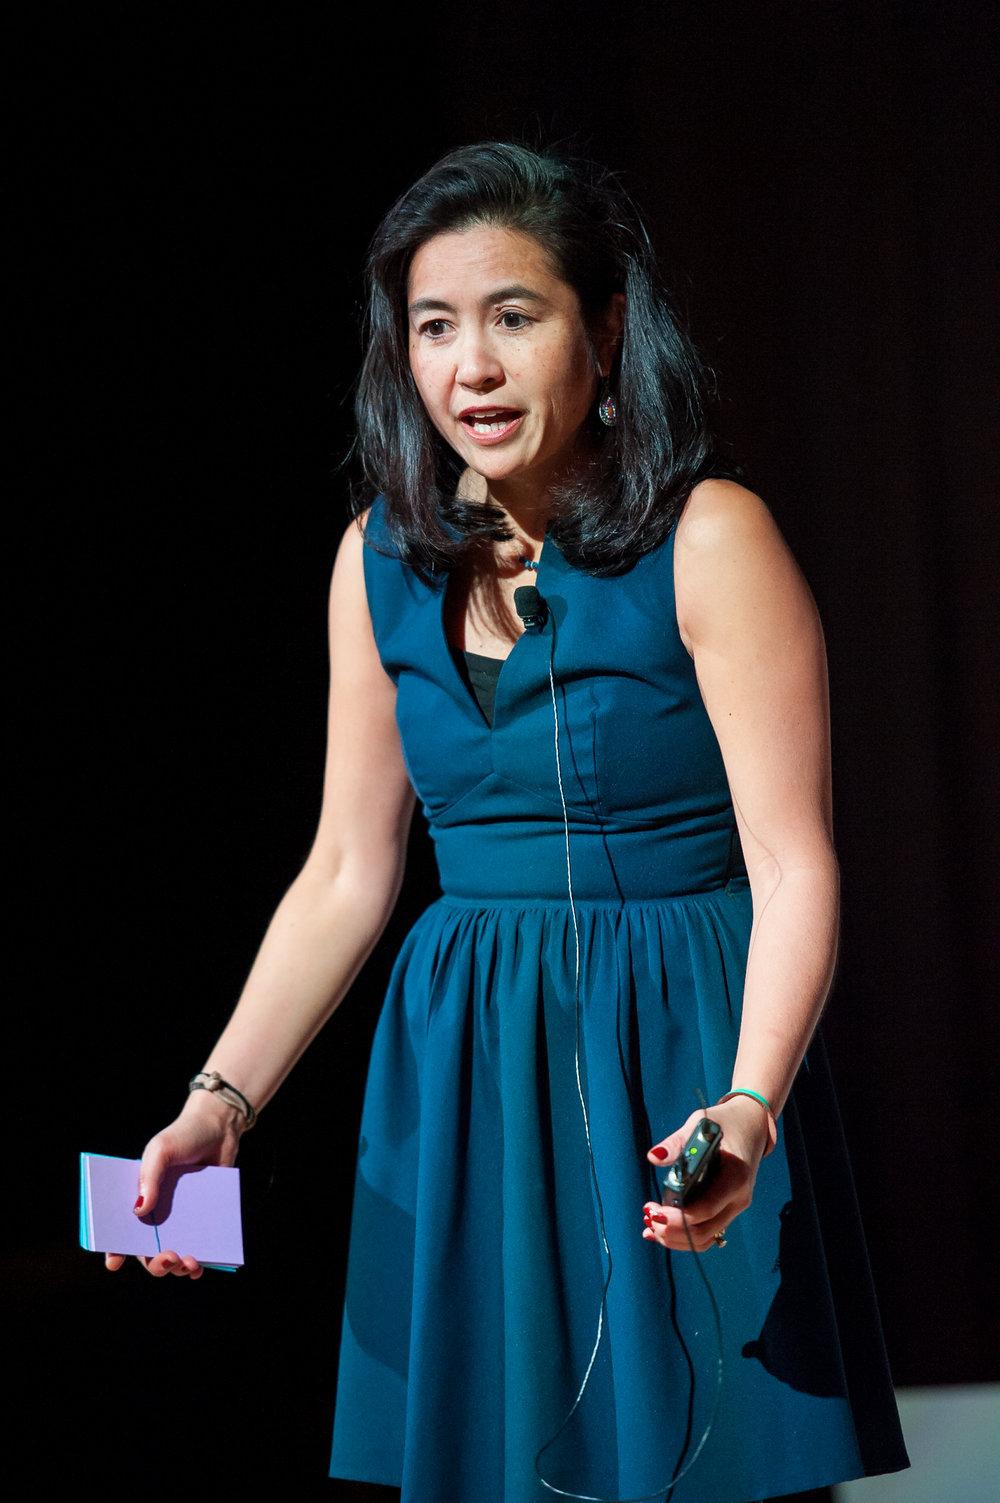 TEDxOPW_2017_033.jpg